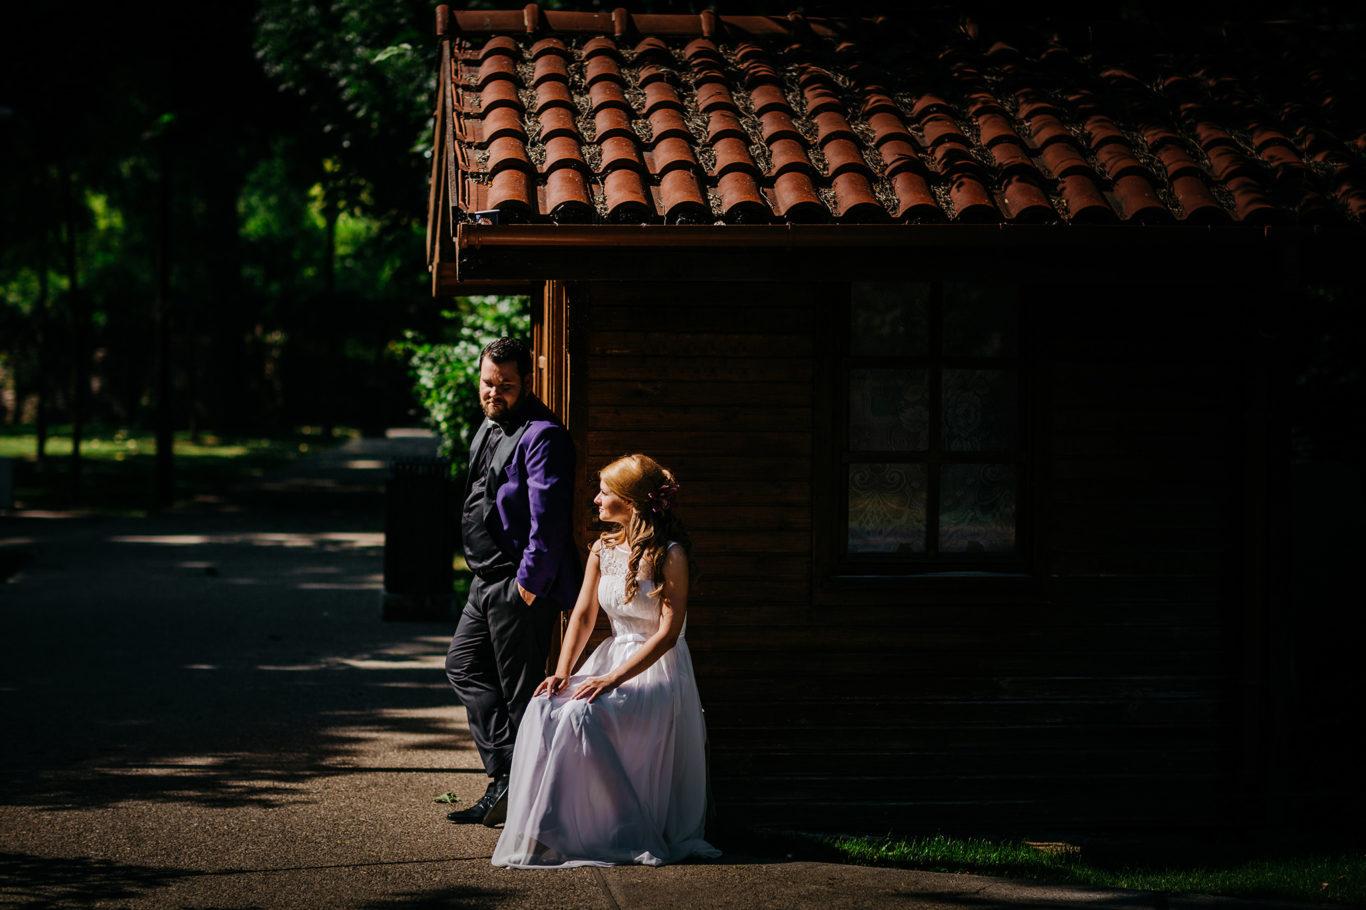 0180-fotografie-nunta-bucuresti-rodica-rares-fotograf-ciprian-dumitrescu-cd2_0050-2